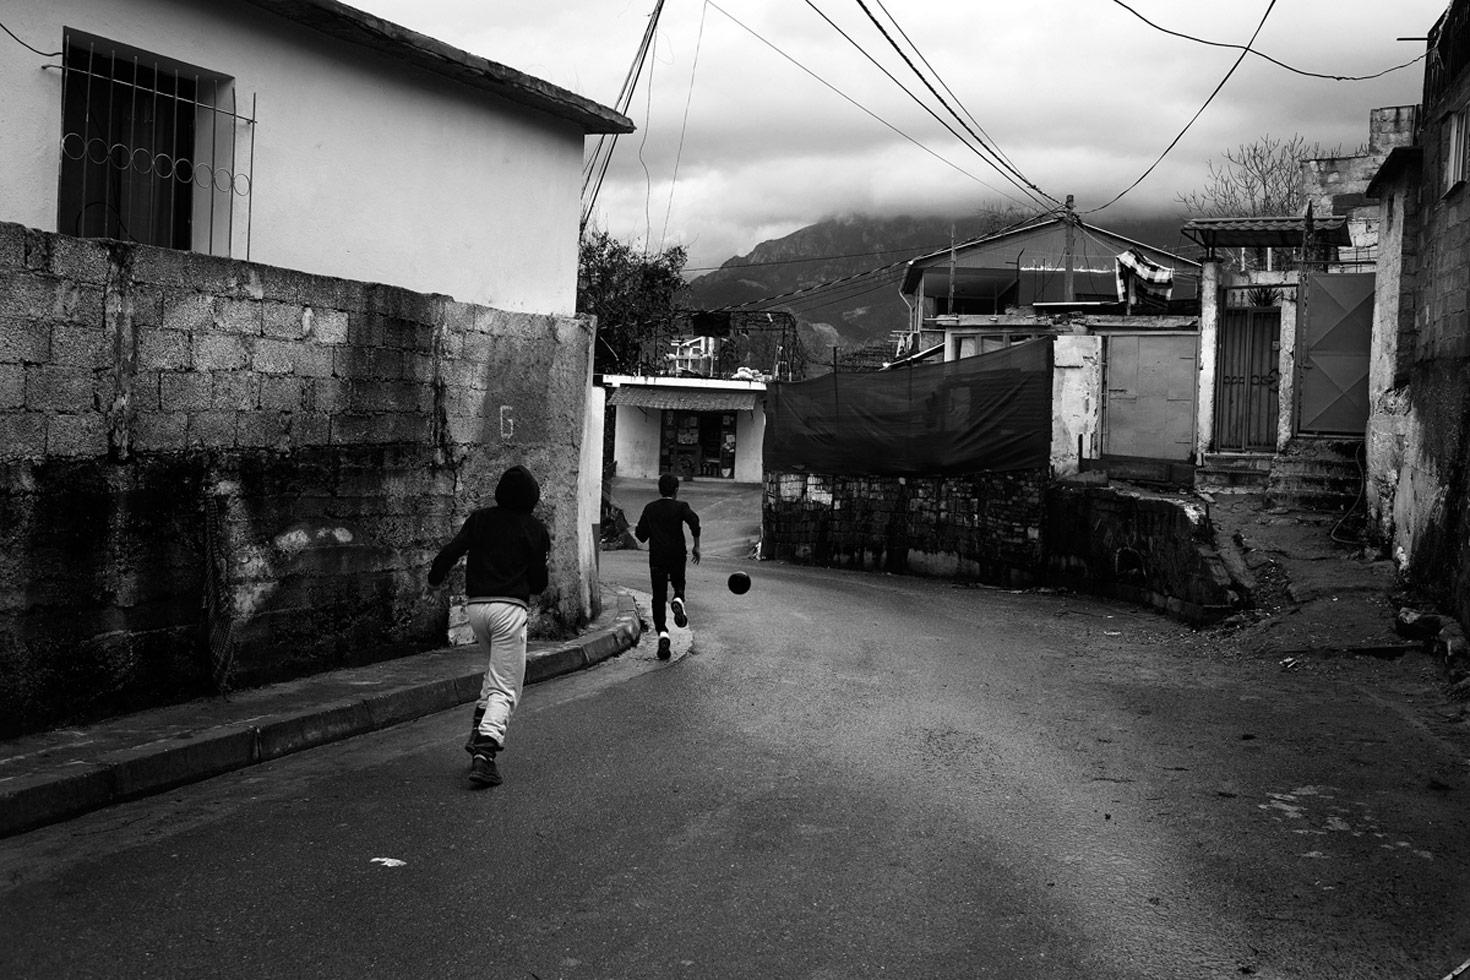 Boys playing in their neighborhood.  Tirana, Albania, 2012